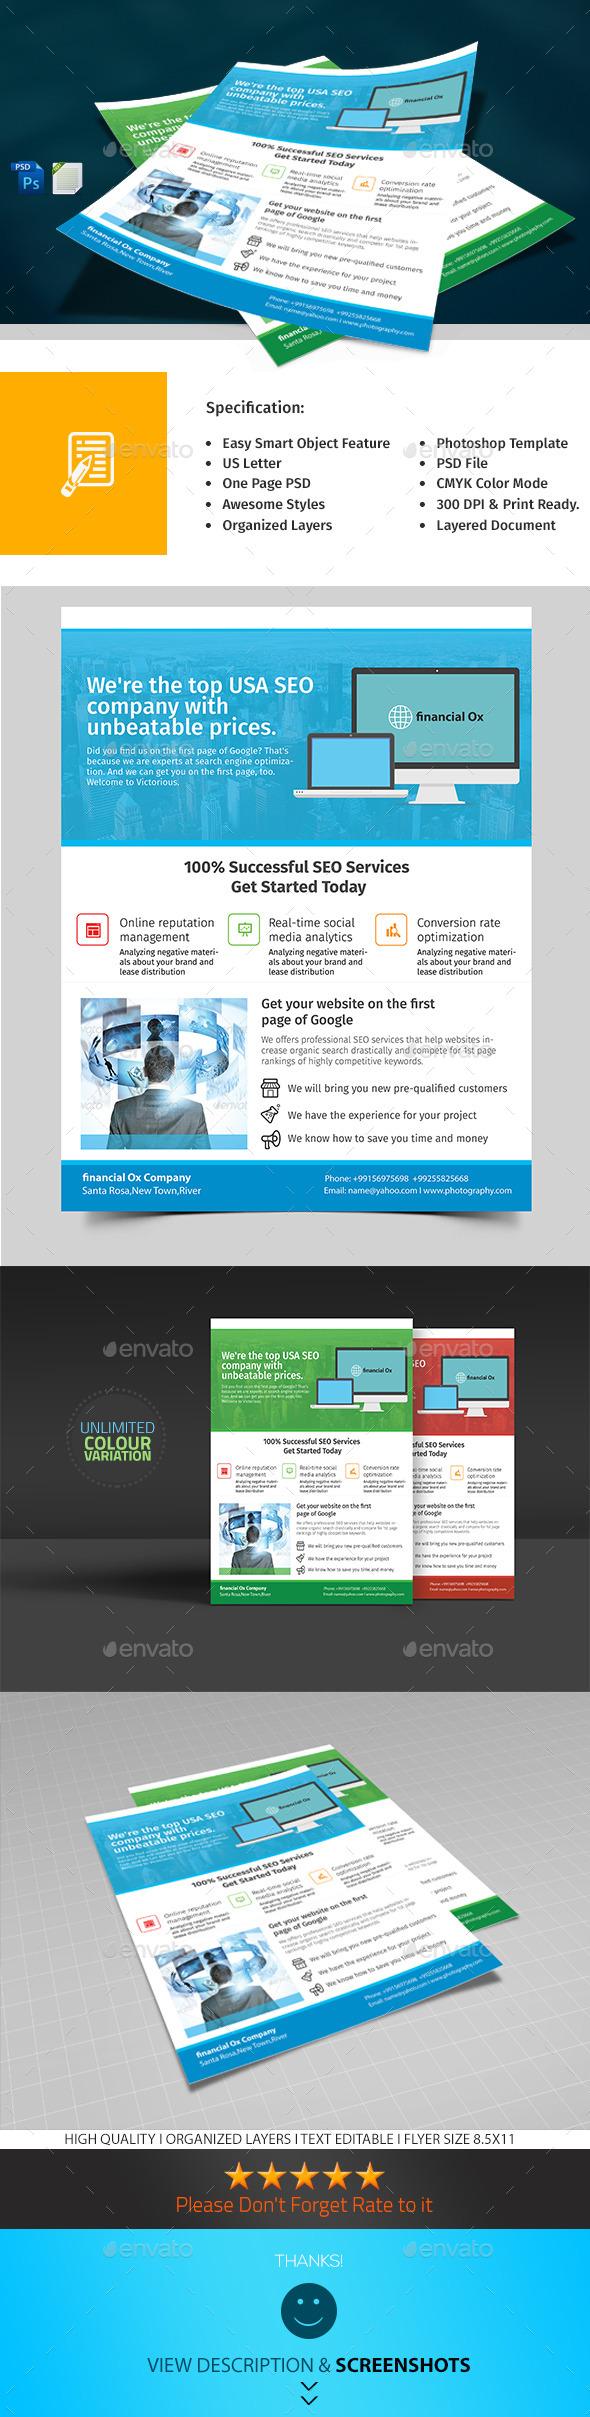 SEO Marketing Flyer - Corporate Flyers